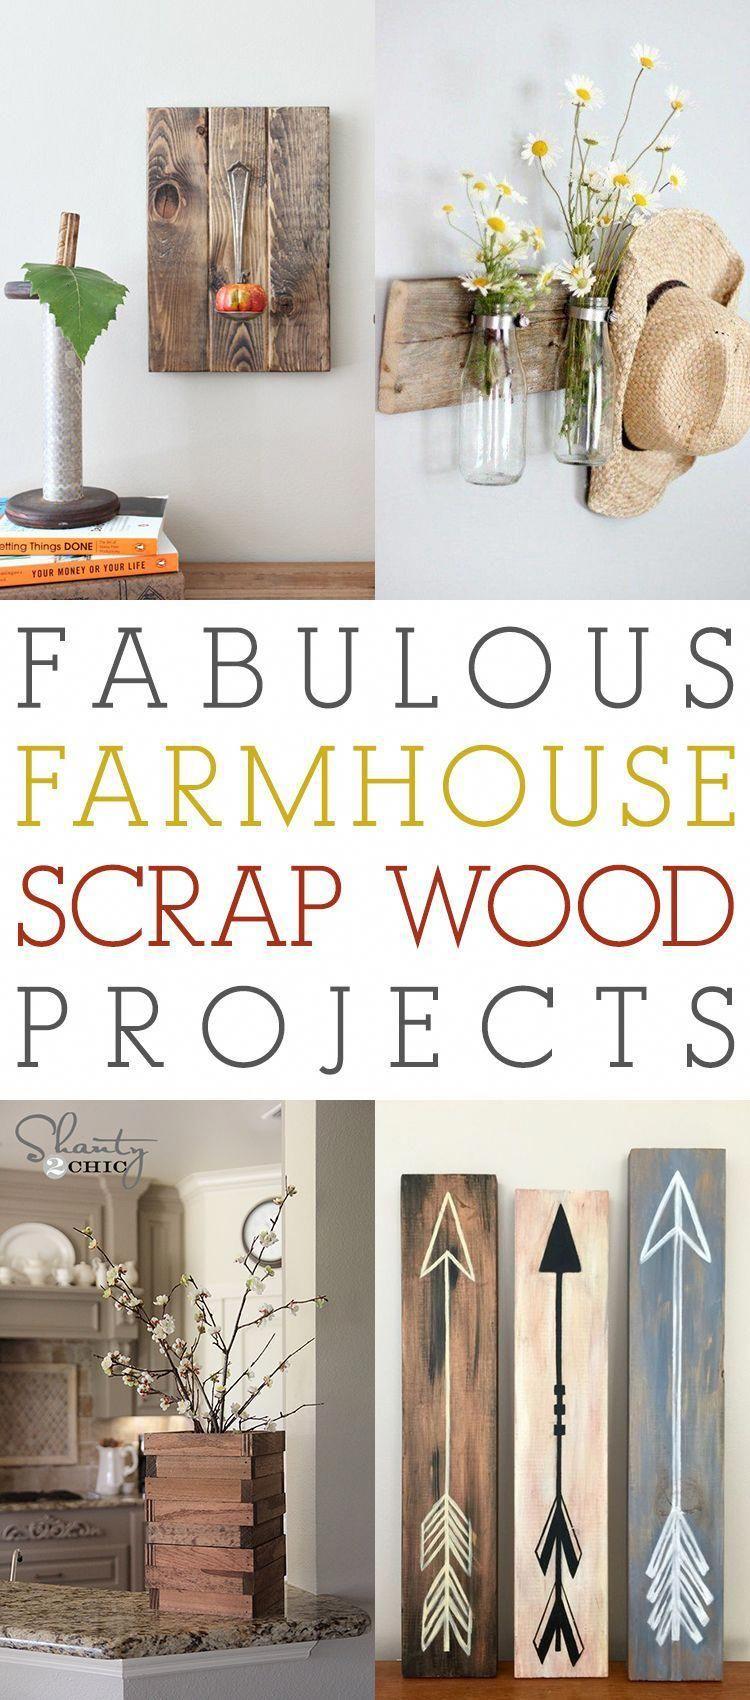 Palettenregal Garten Genial Farmhouse Scrap Wood Project Ideas Including Diy Wall Art